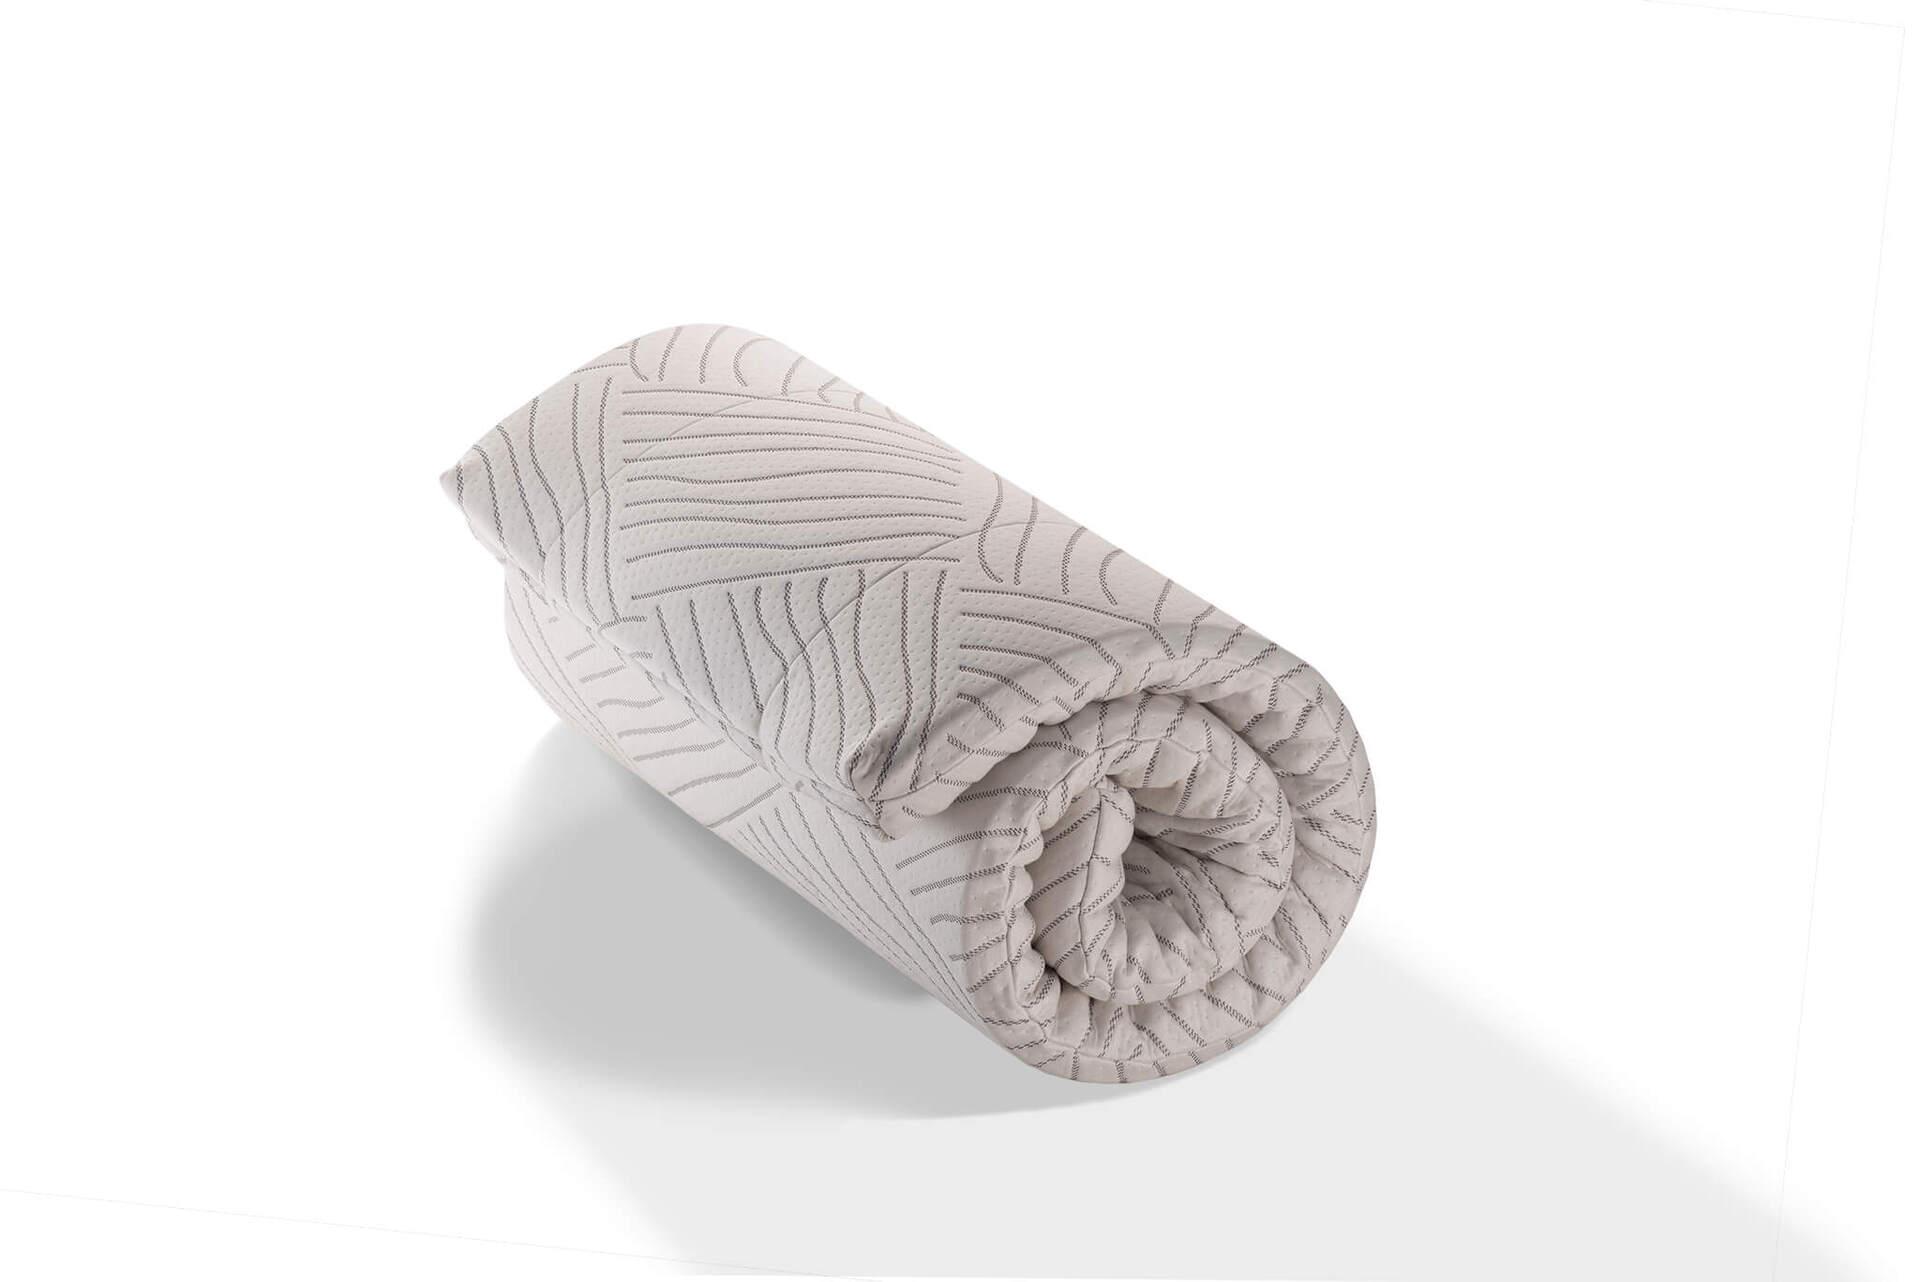 Топ матрак Topper Massage - 7 см - Sleepy